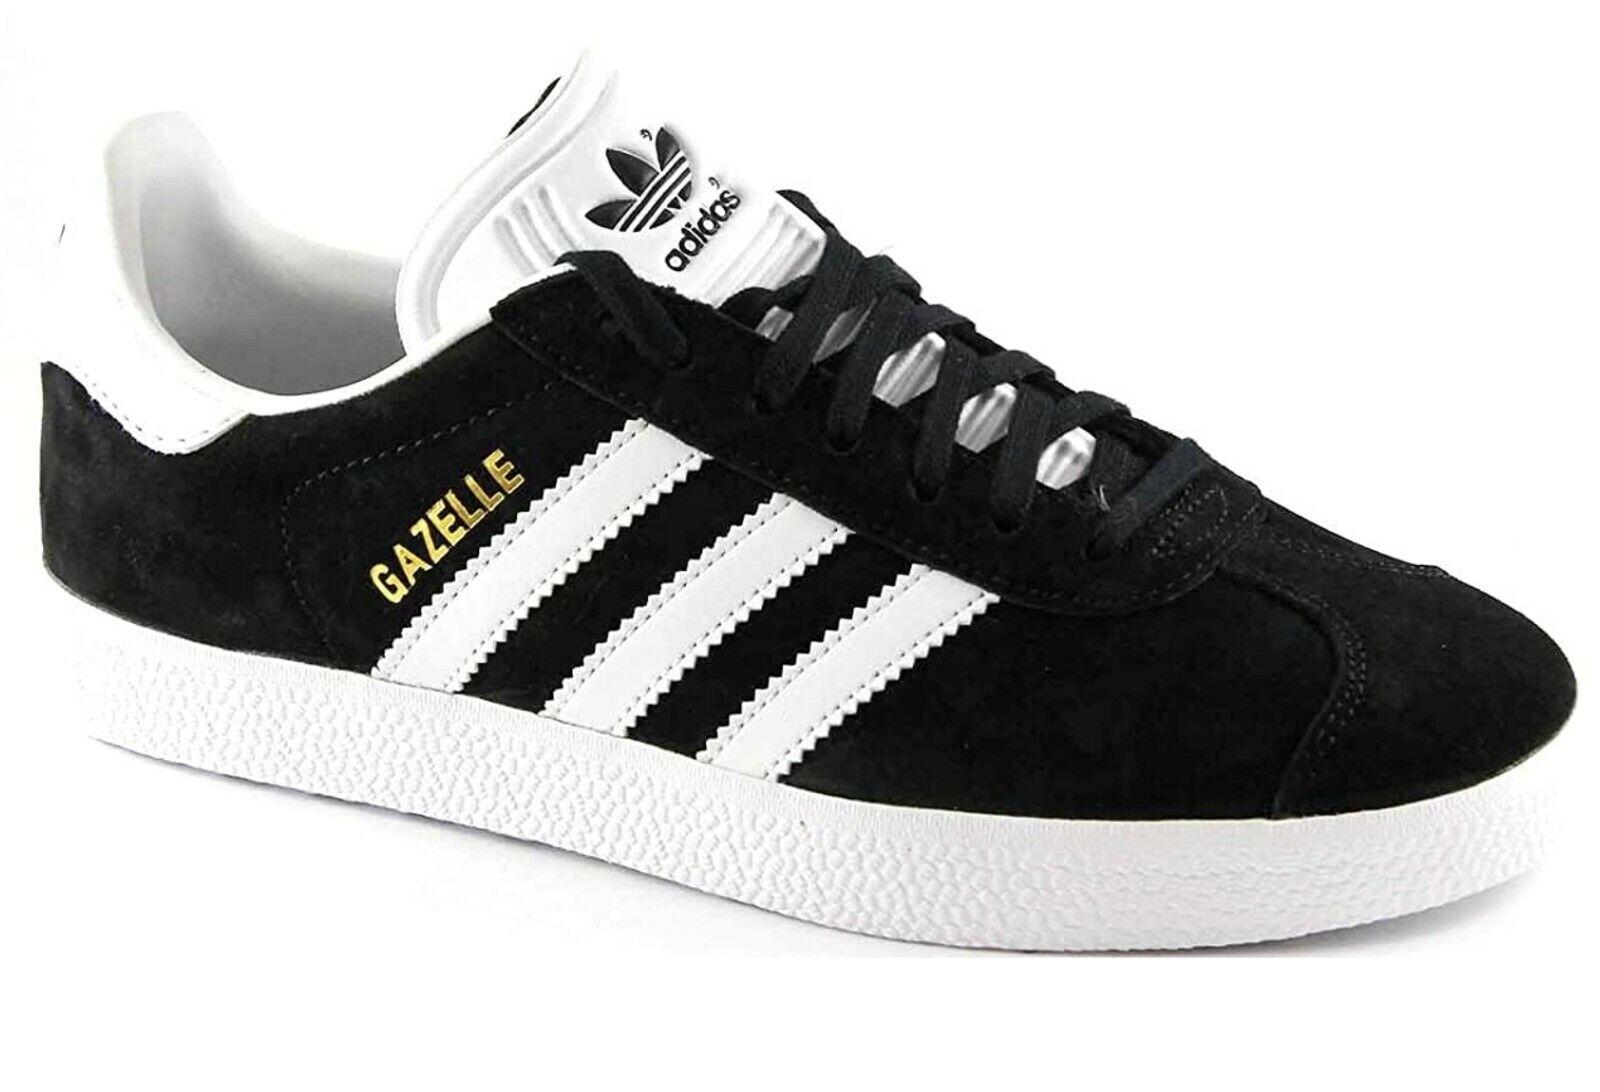 Size 8.5 - adidas Gazelle Black - BB5476